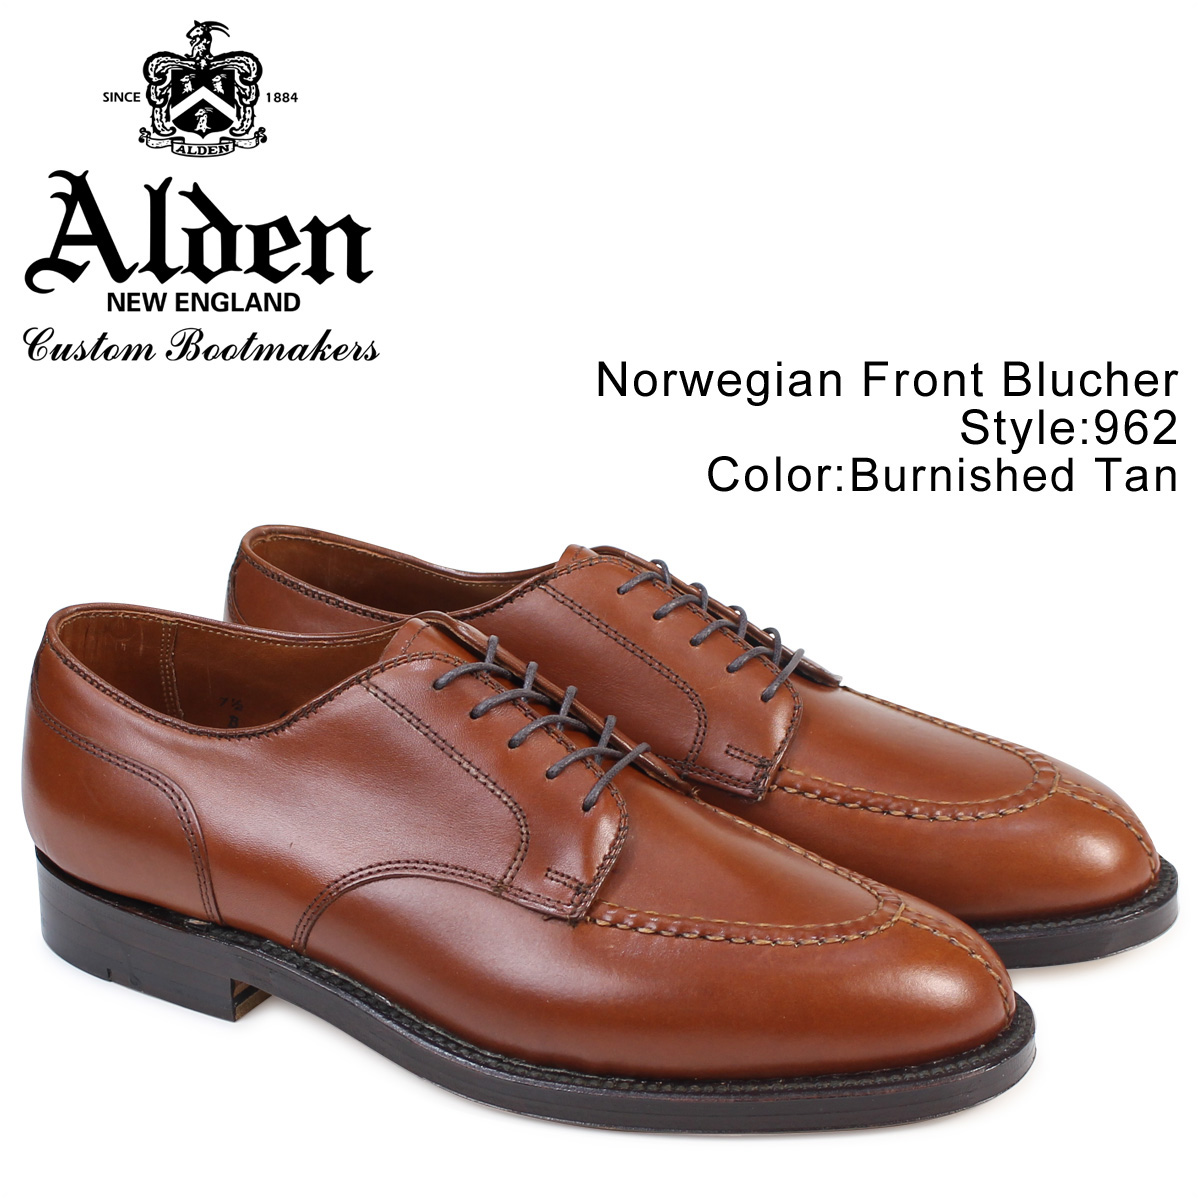 ALDEN オールデン ローファー シューズ メンズ NORWEGIAN FRONT BLUCHER Dワイズ 962